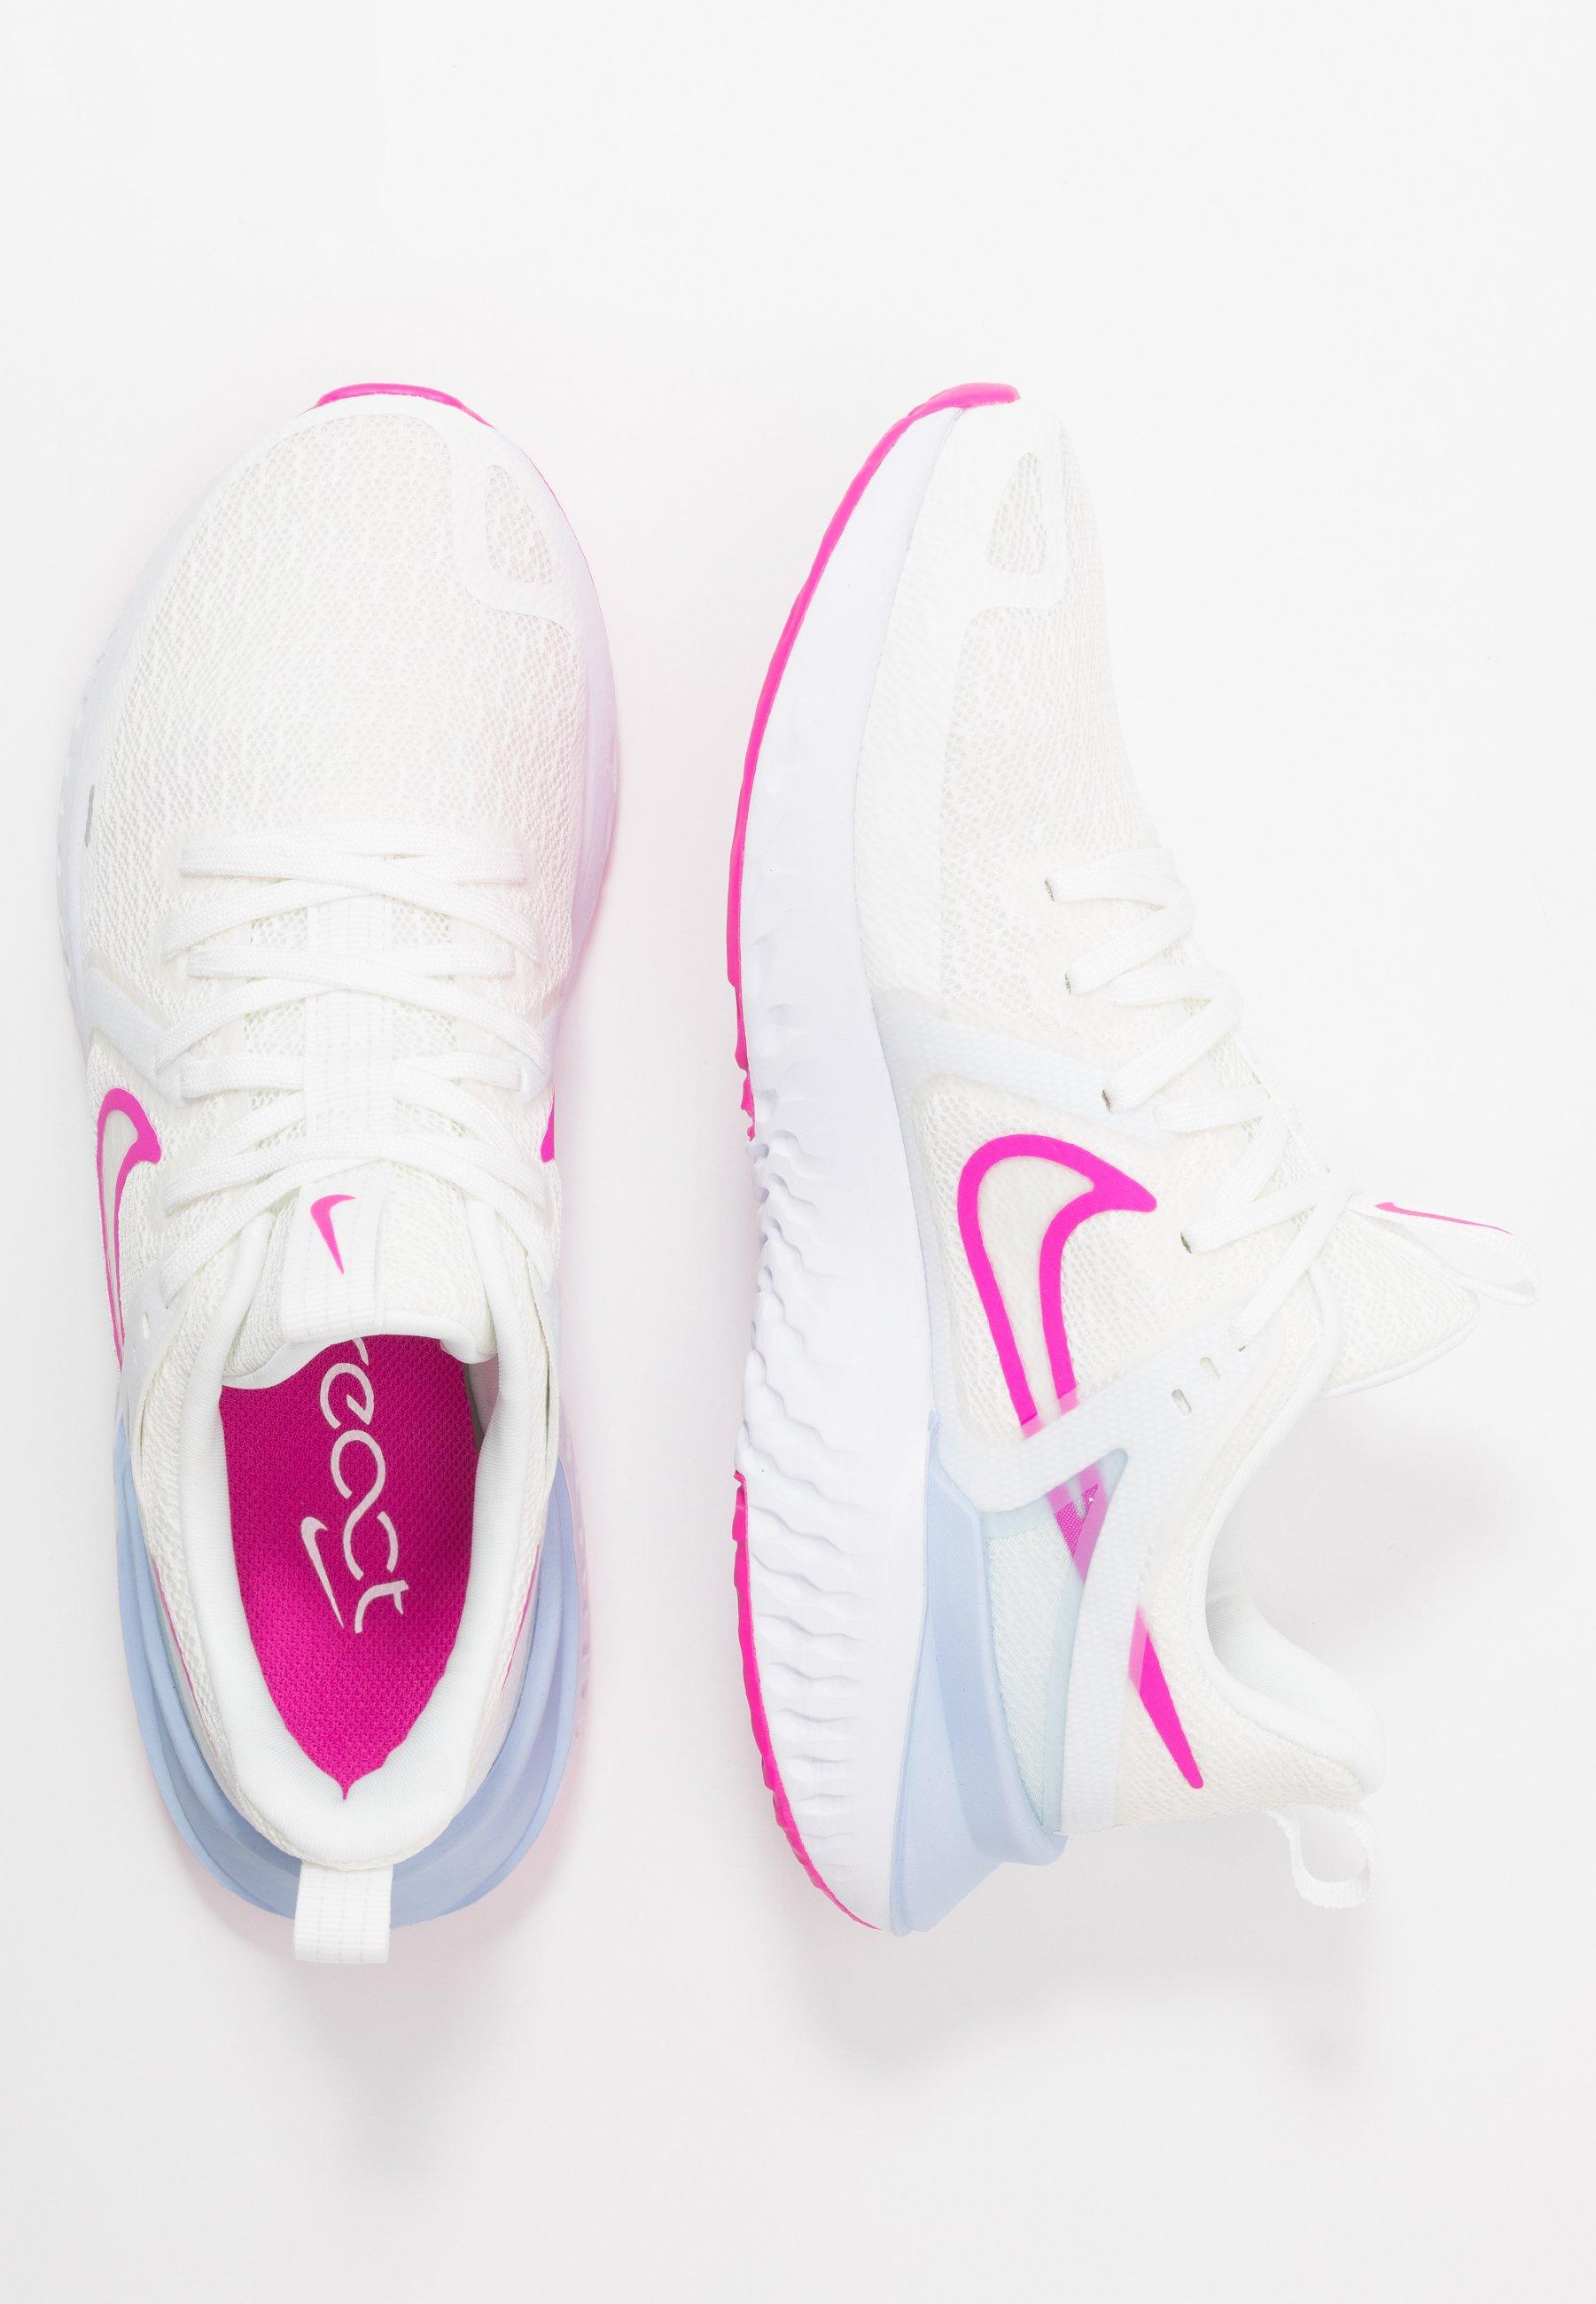 LEGEND REACT 2 Chaussures de running neutres summit whitefire pinkhydrogen blue